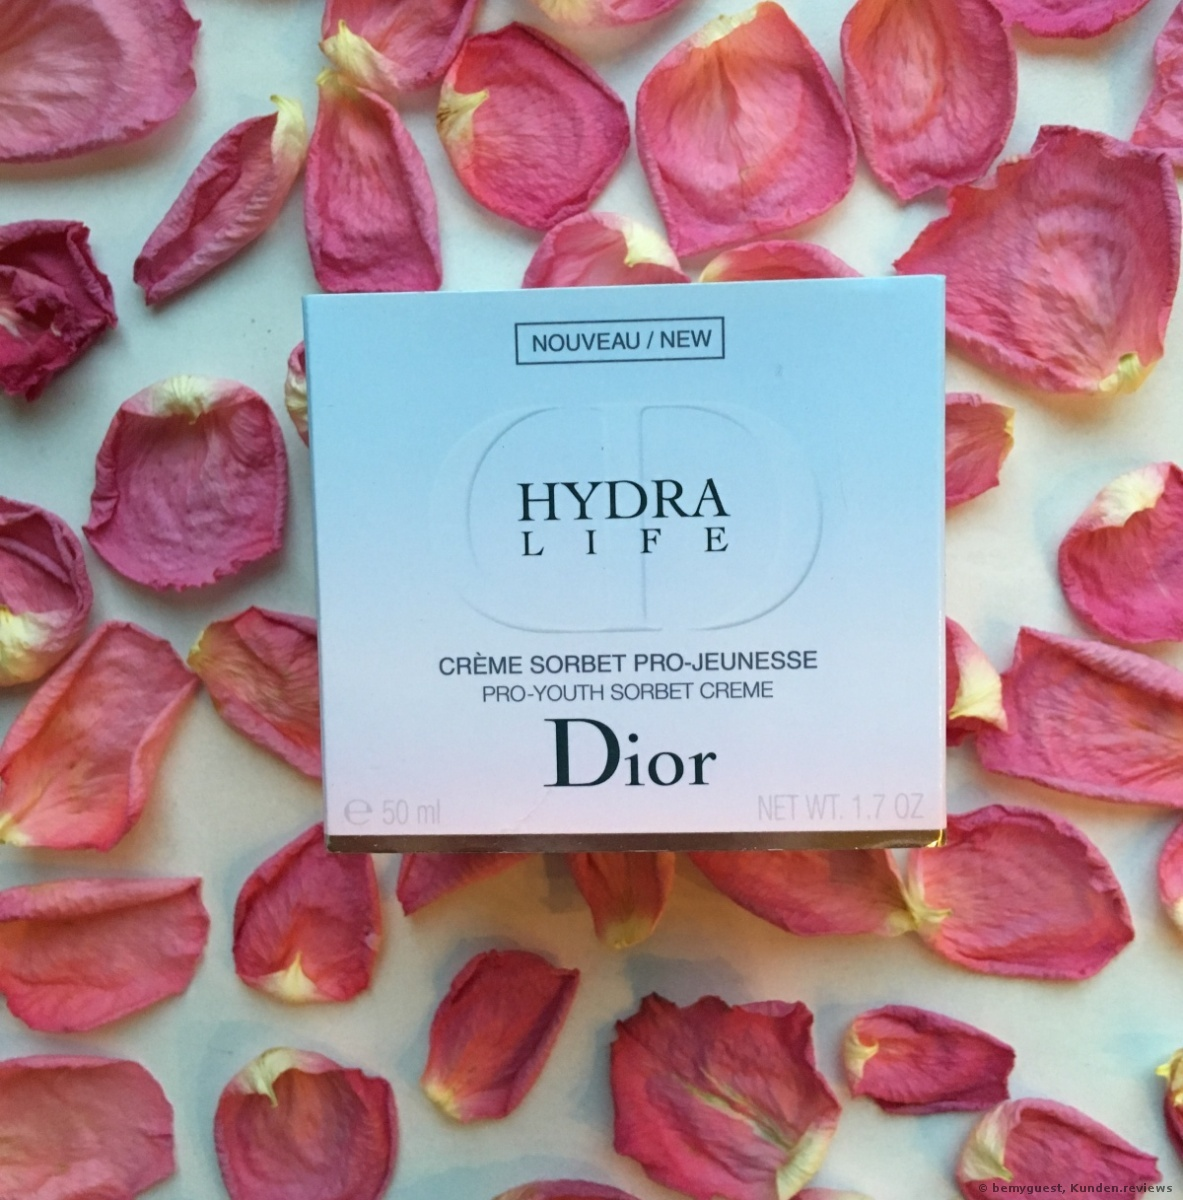 Dior Sorbet Pro-Jeunesse Hydra Life Pro-Youth Silk Creme Gesichtscreme Foto